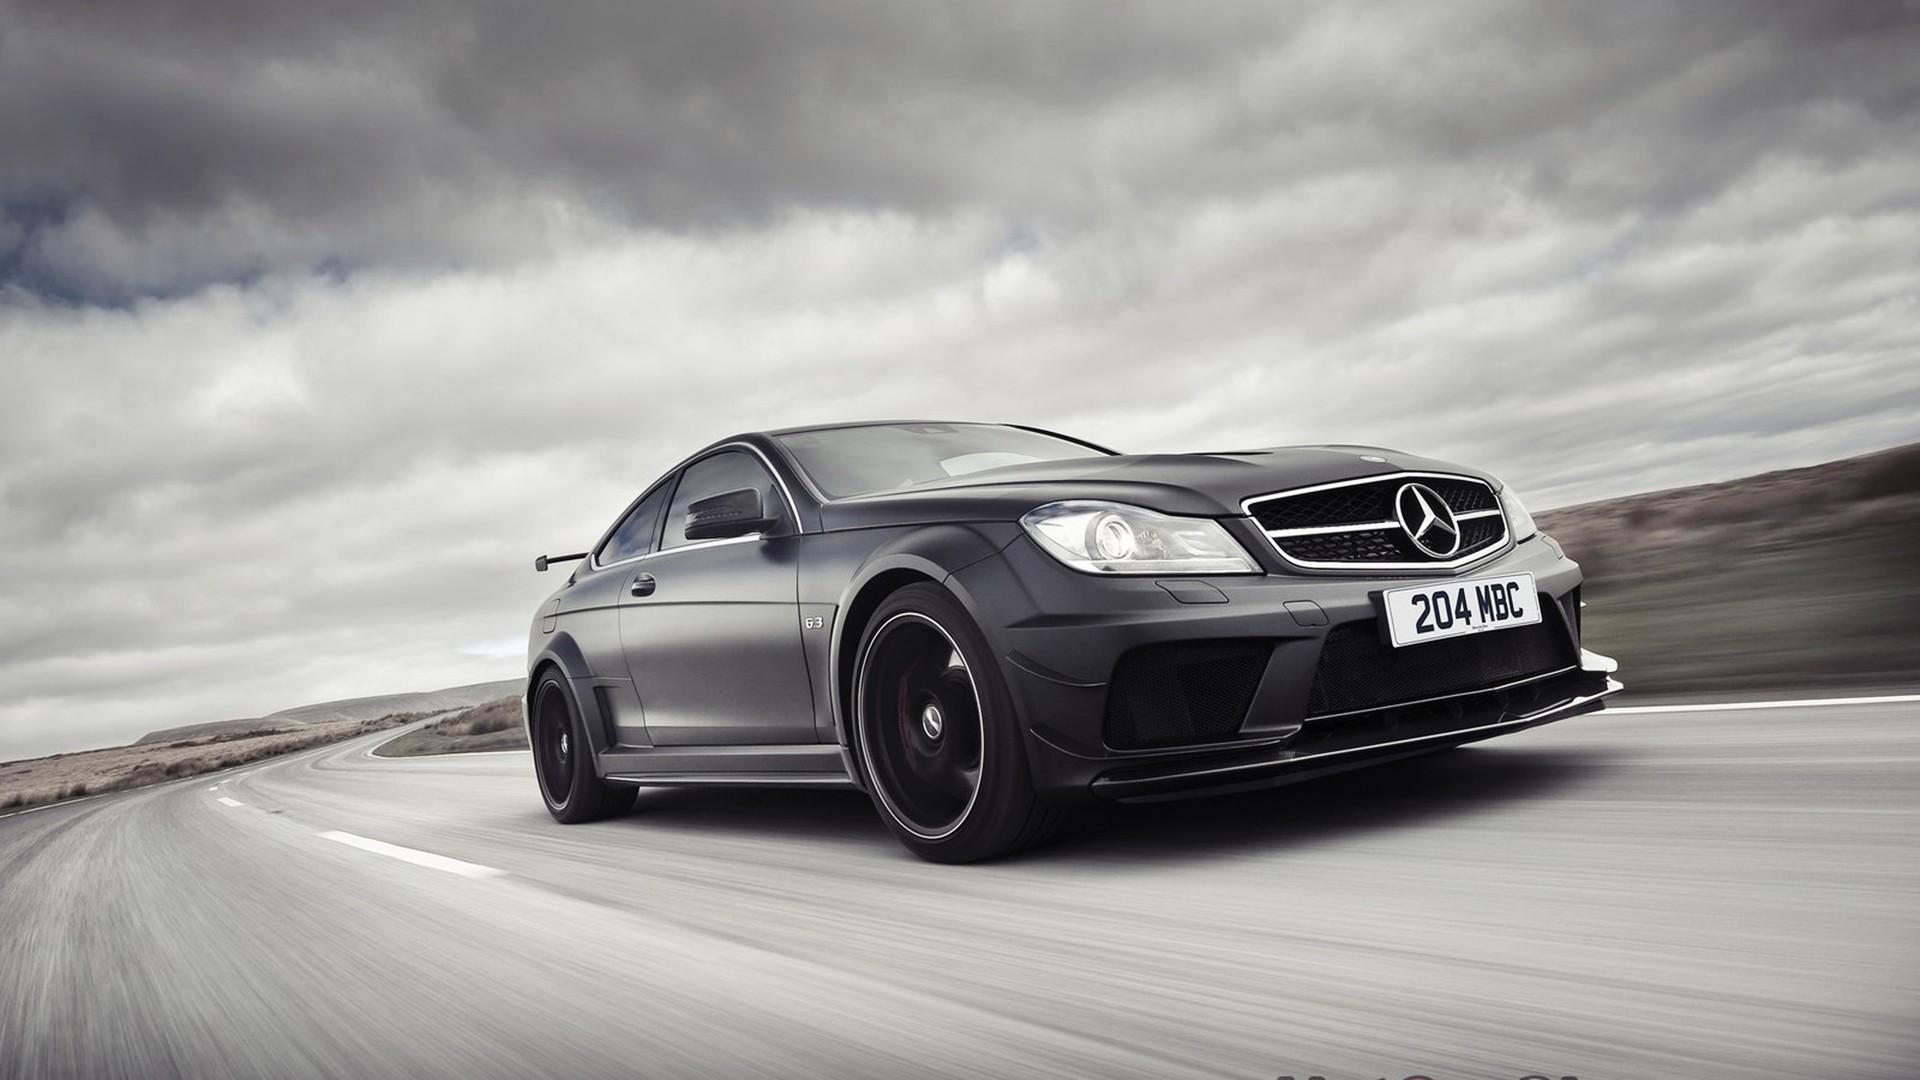 automotive royal respect - photo #2